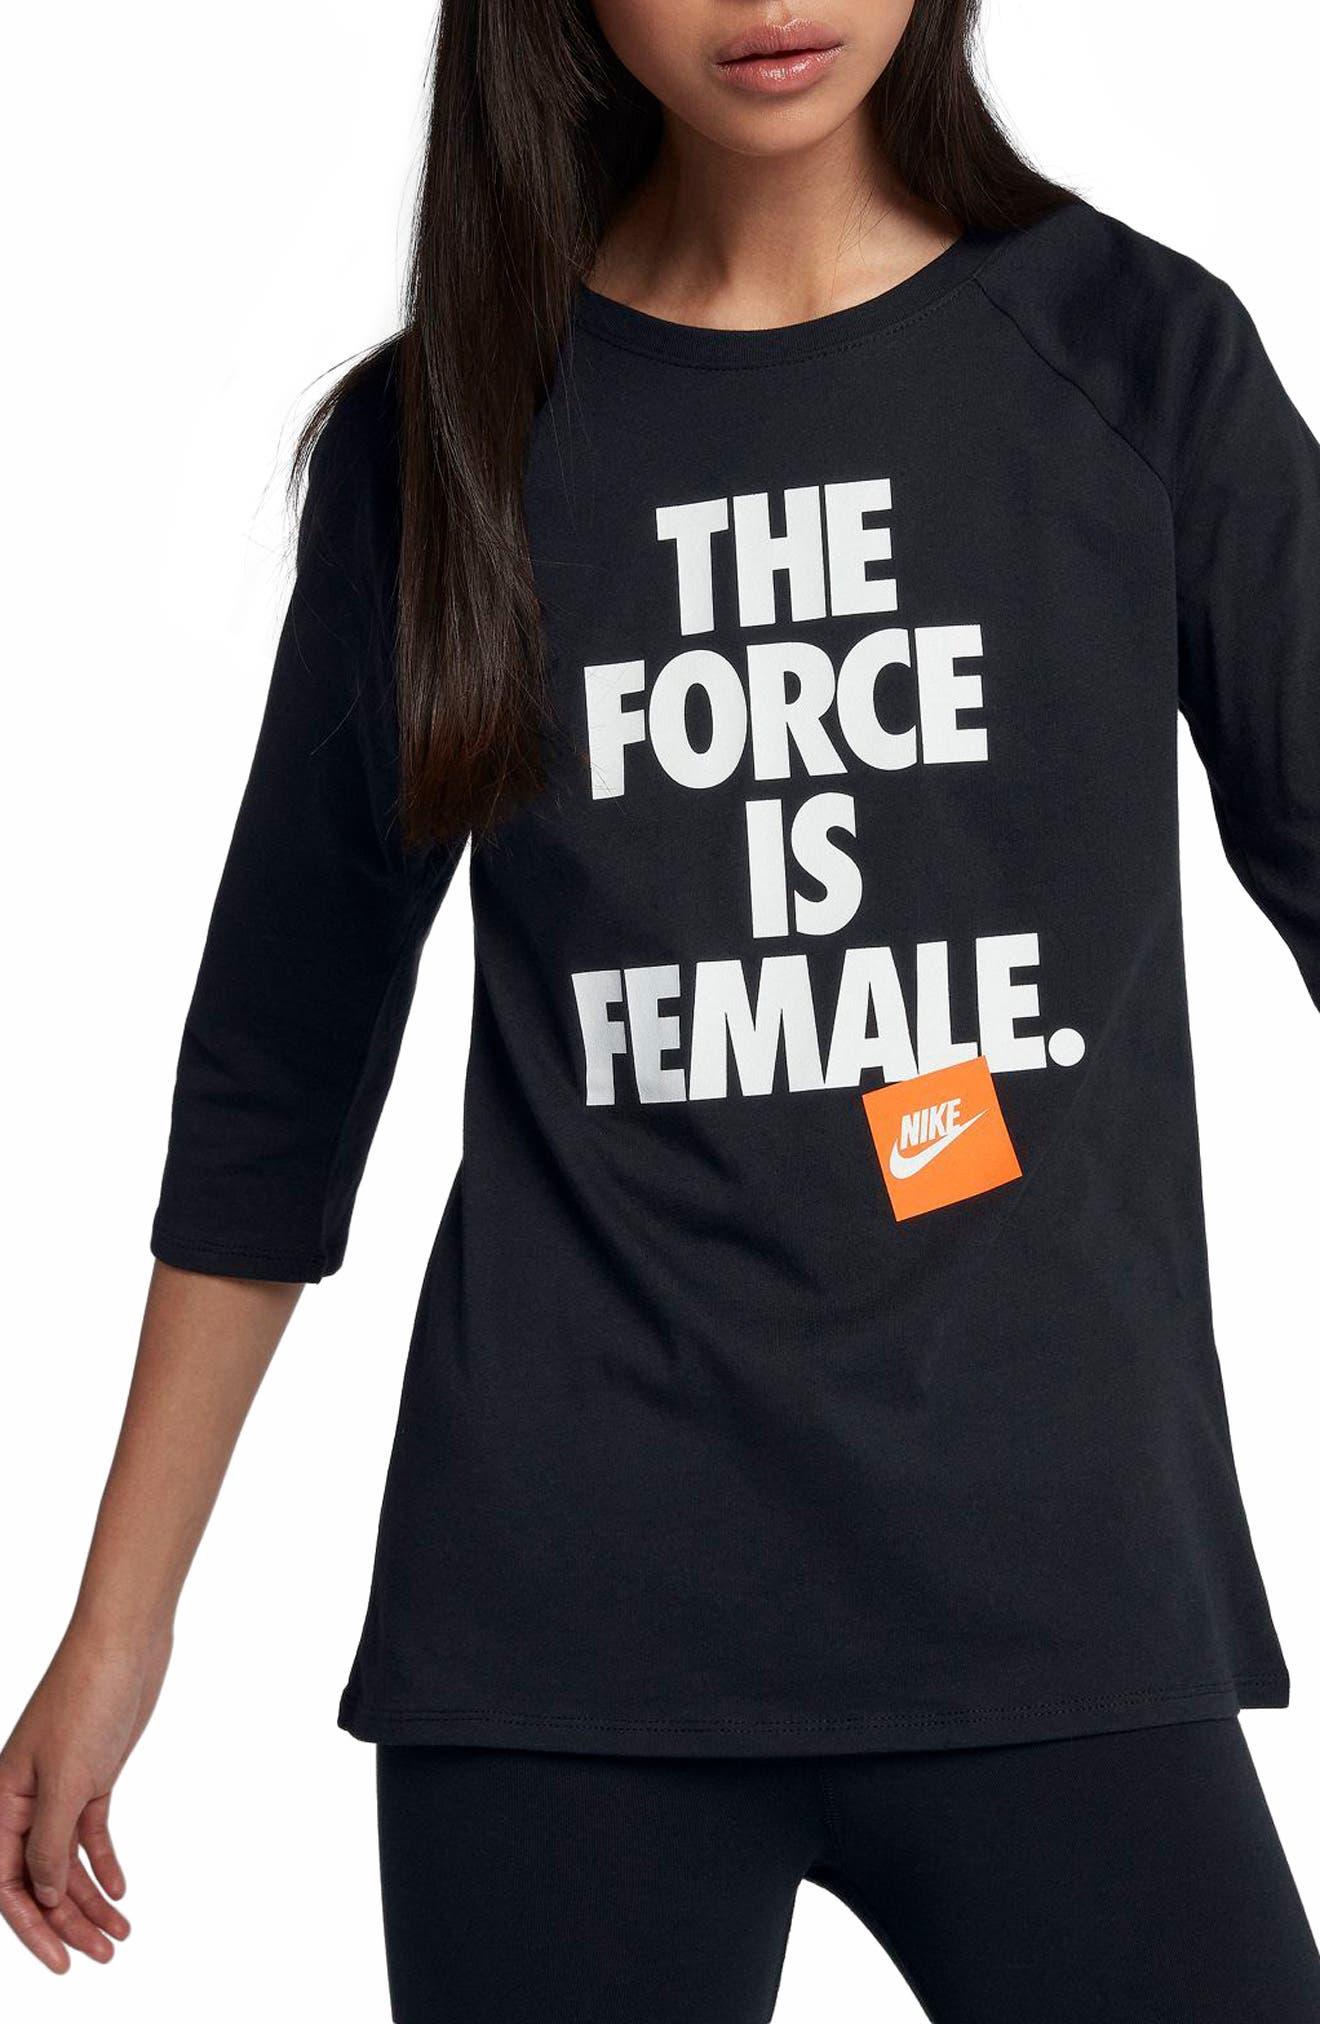 Sportswear The Force Is Female Raglan Tee,                             Main thumbnail 1, color,                             Black/ Black/ White